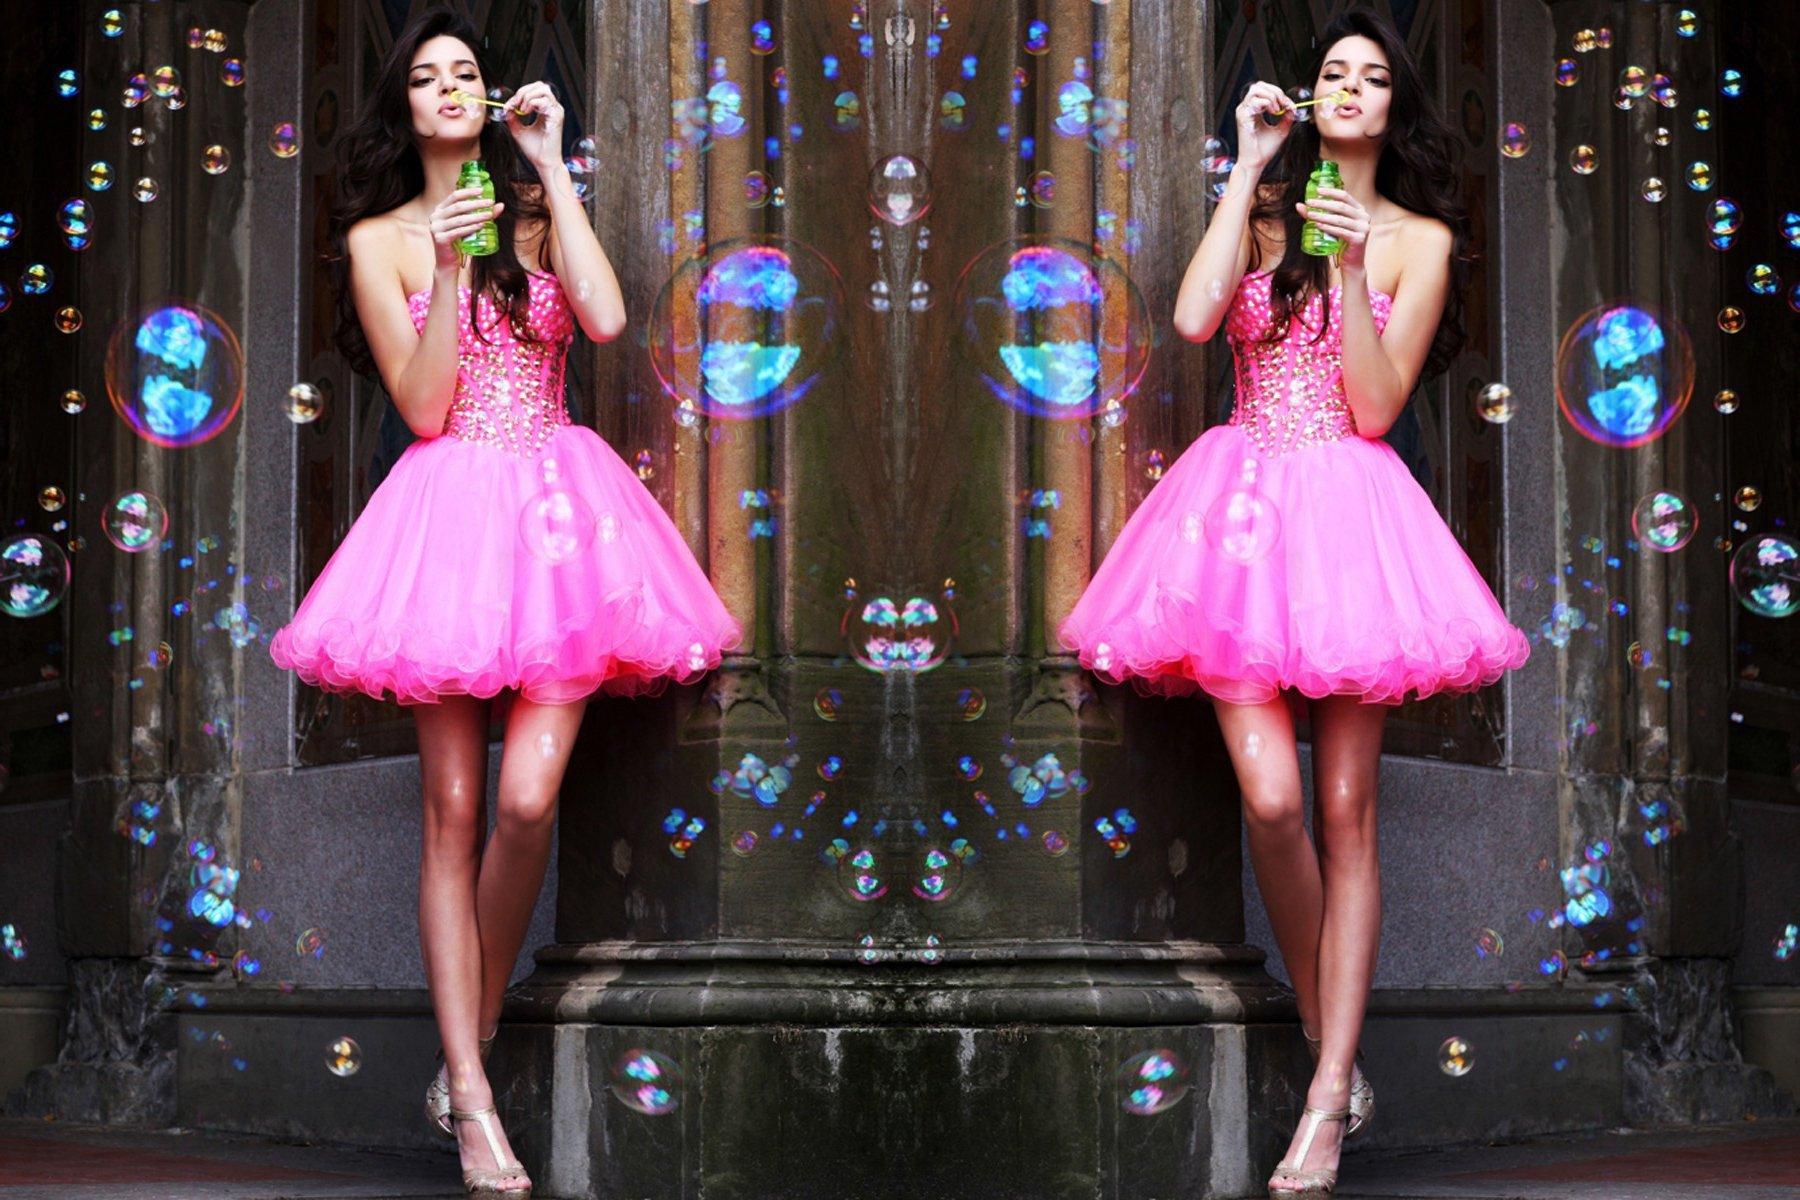 Celebrita' - Kendall Jenner  Sfondo